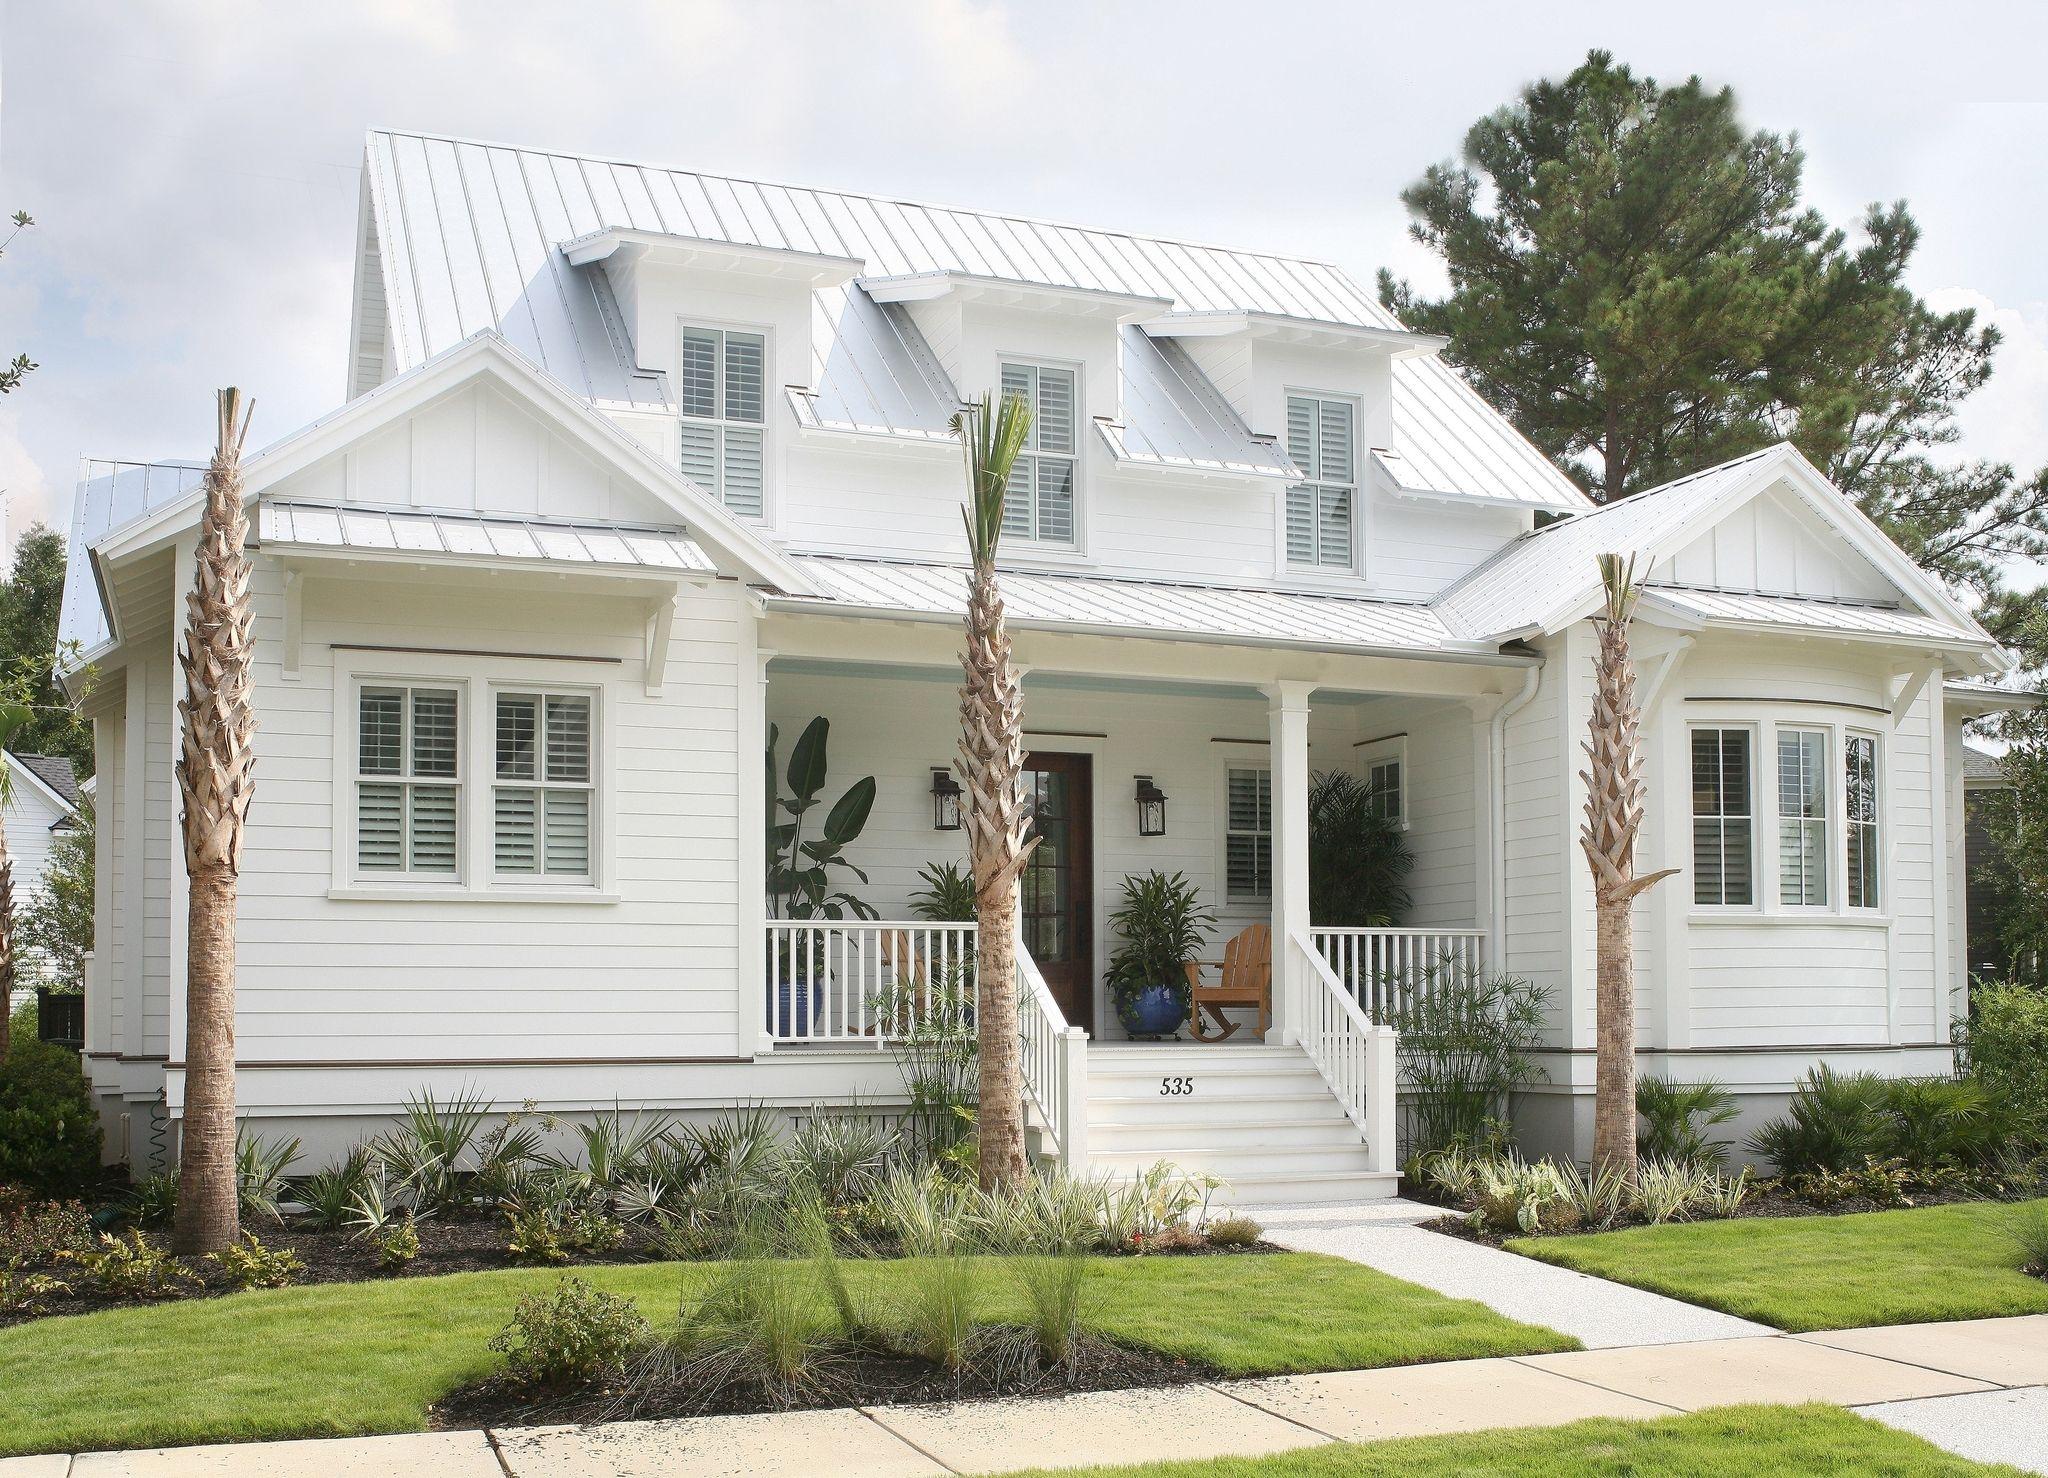 Breeze Collection Flatfish Island Designs Coastal Home Plans Coastal House Plans Cottage House Plans Cottage Homes